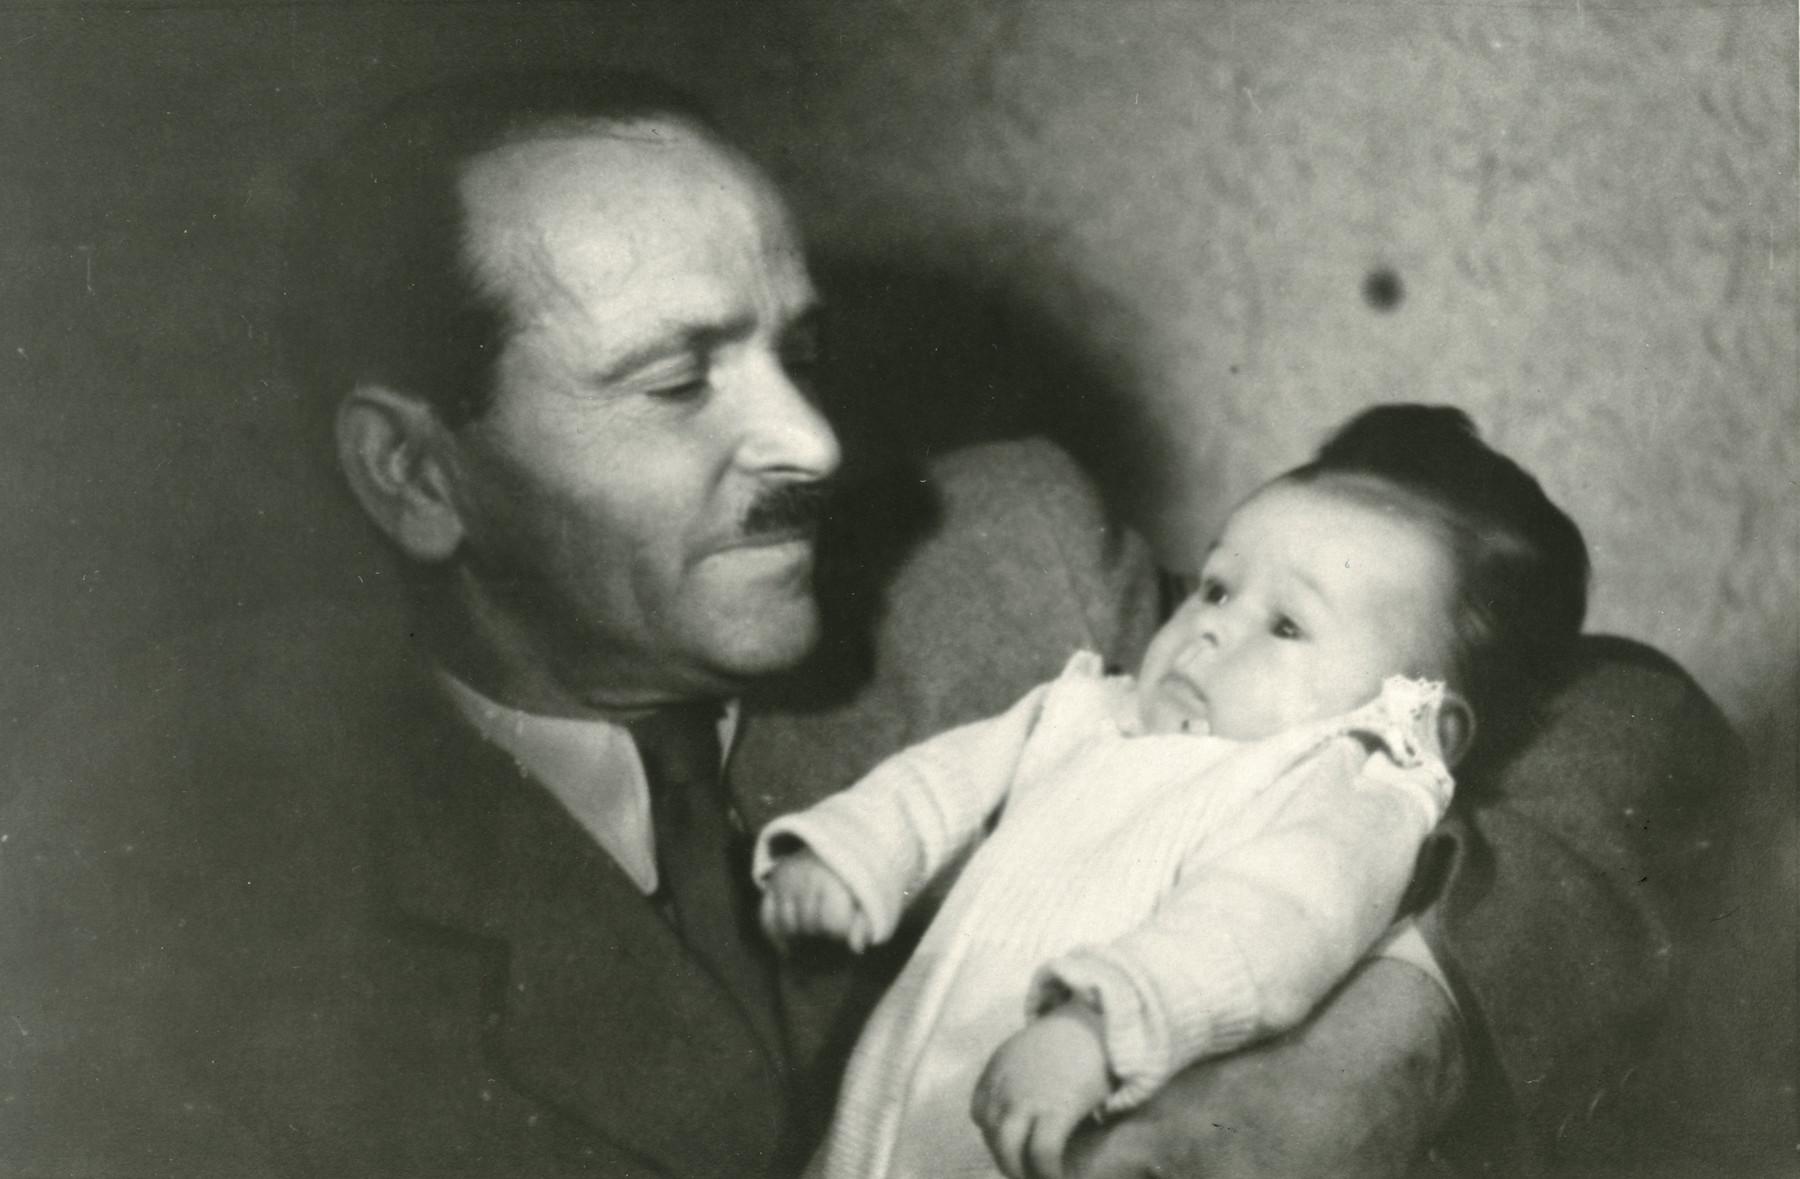 Avraham Bernat Koviliak holds his infant daughter Sara in his arms.